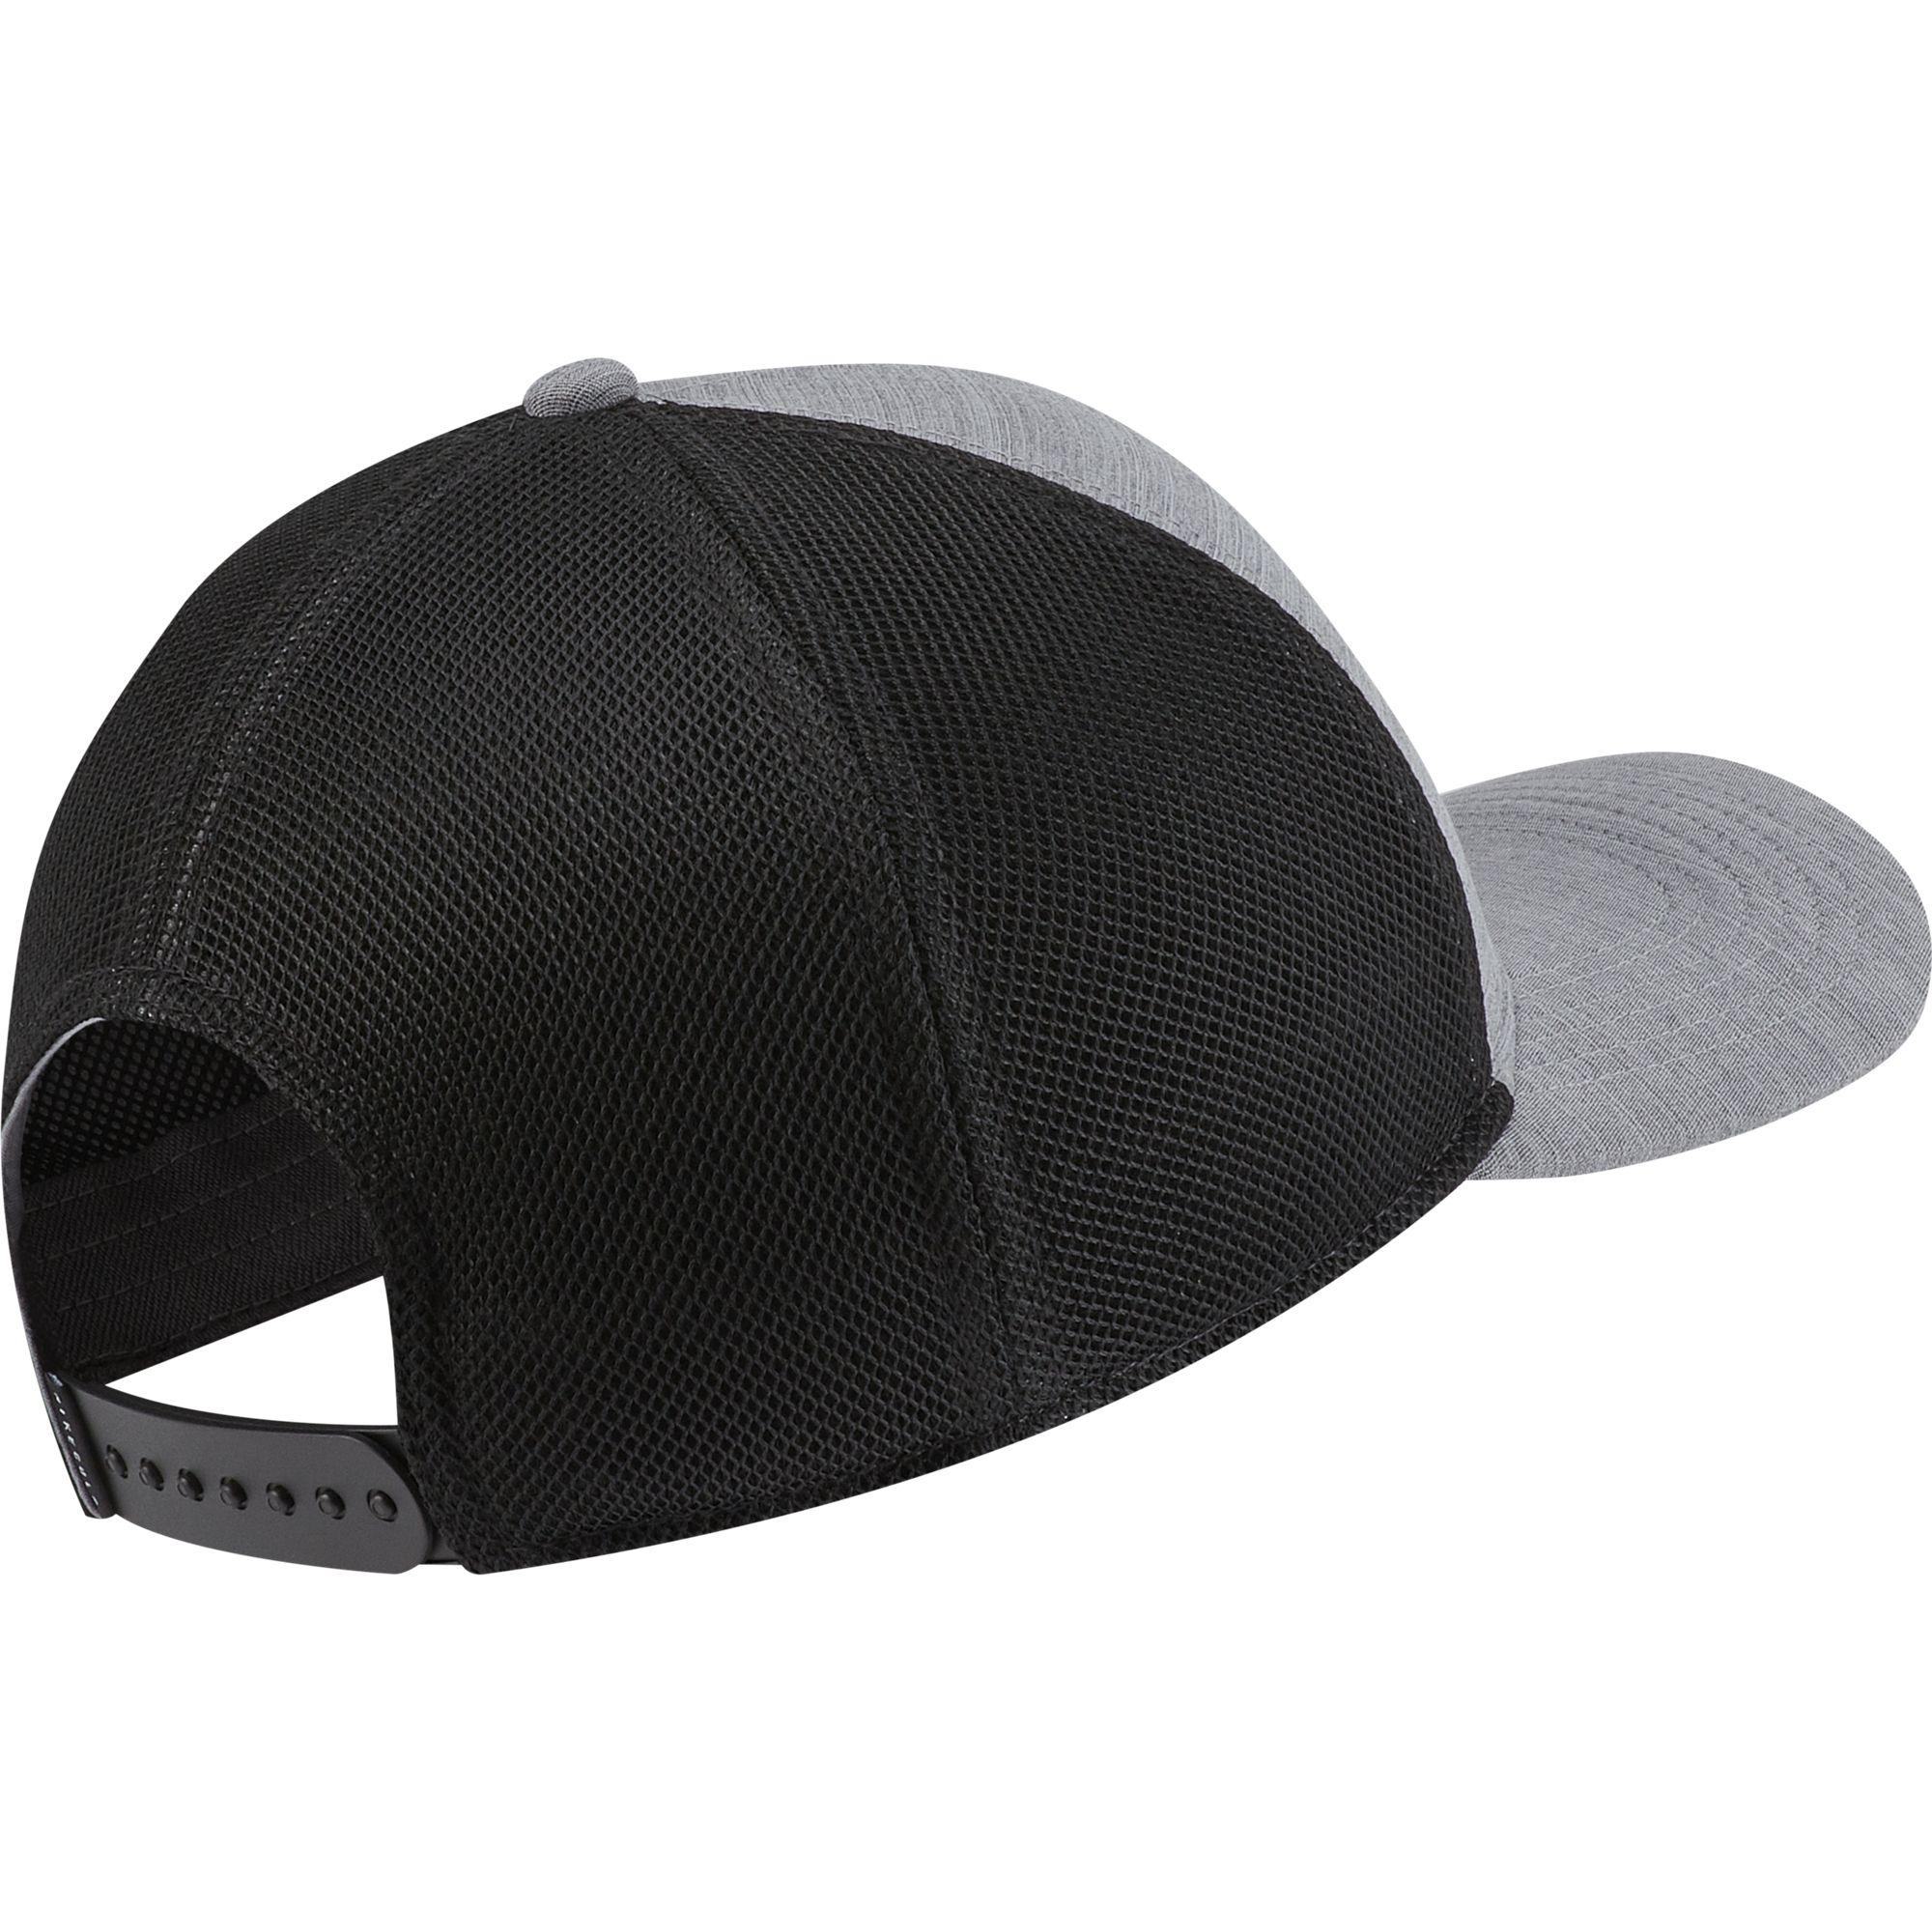 AeroBill Classic99 Mesh Golf Hat, Charcoal/Black, swatch